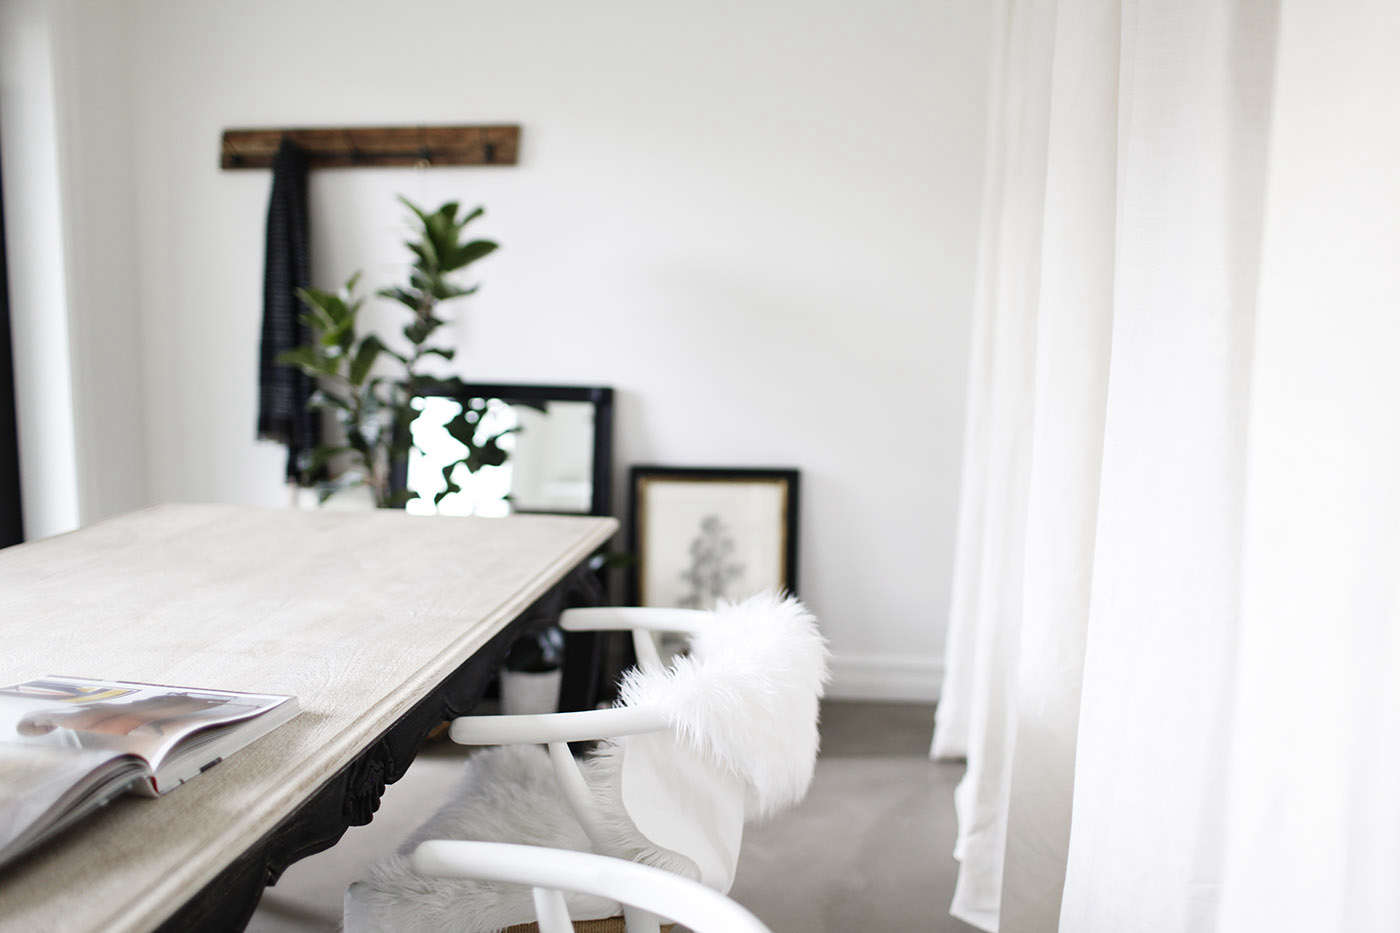 h2 design + build office in seattle | remodelista 17